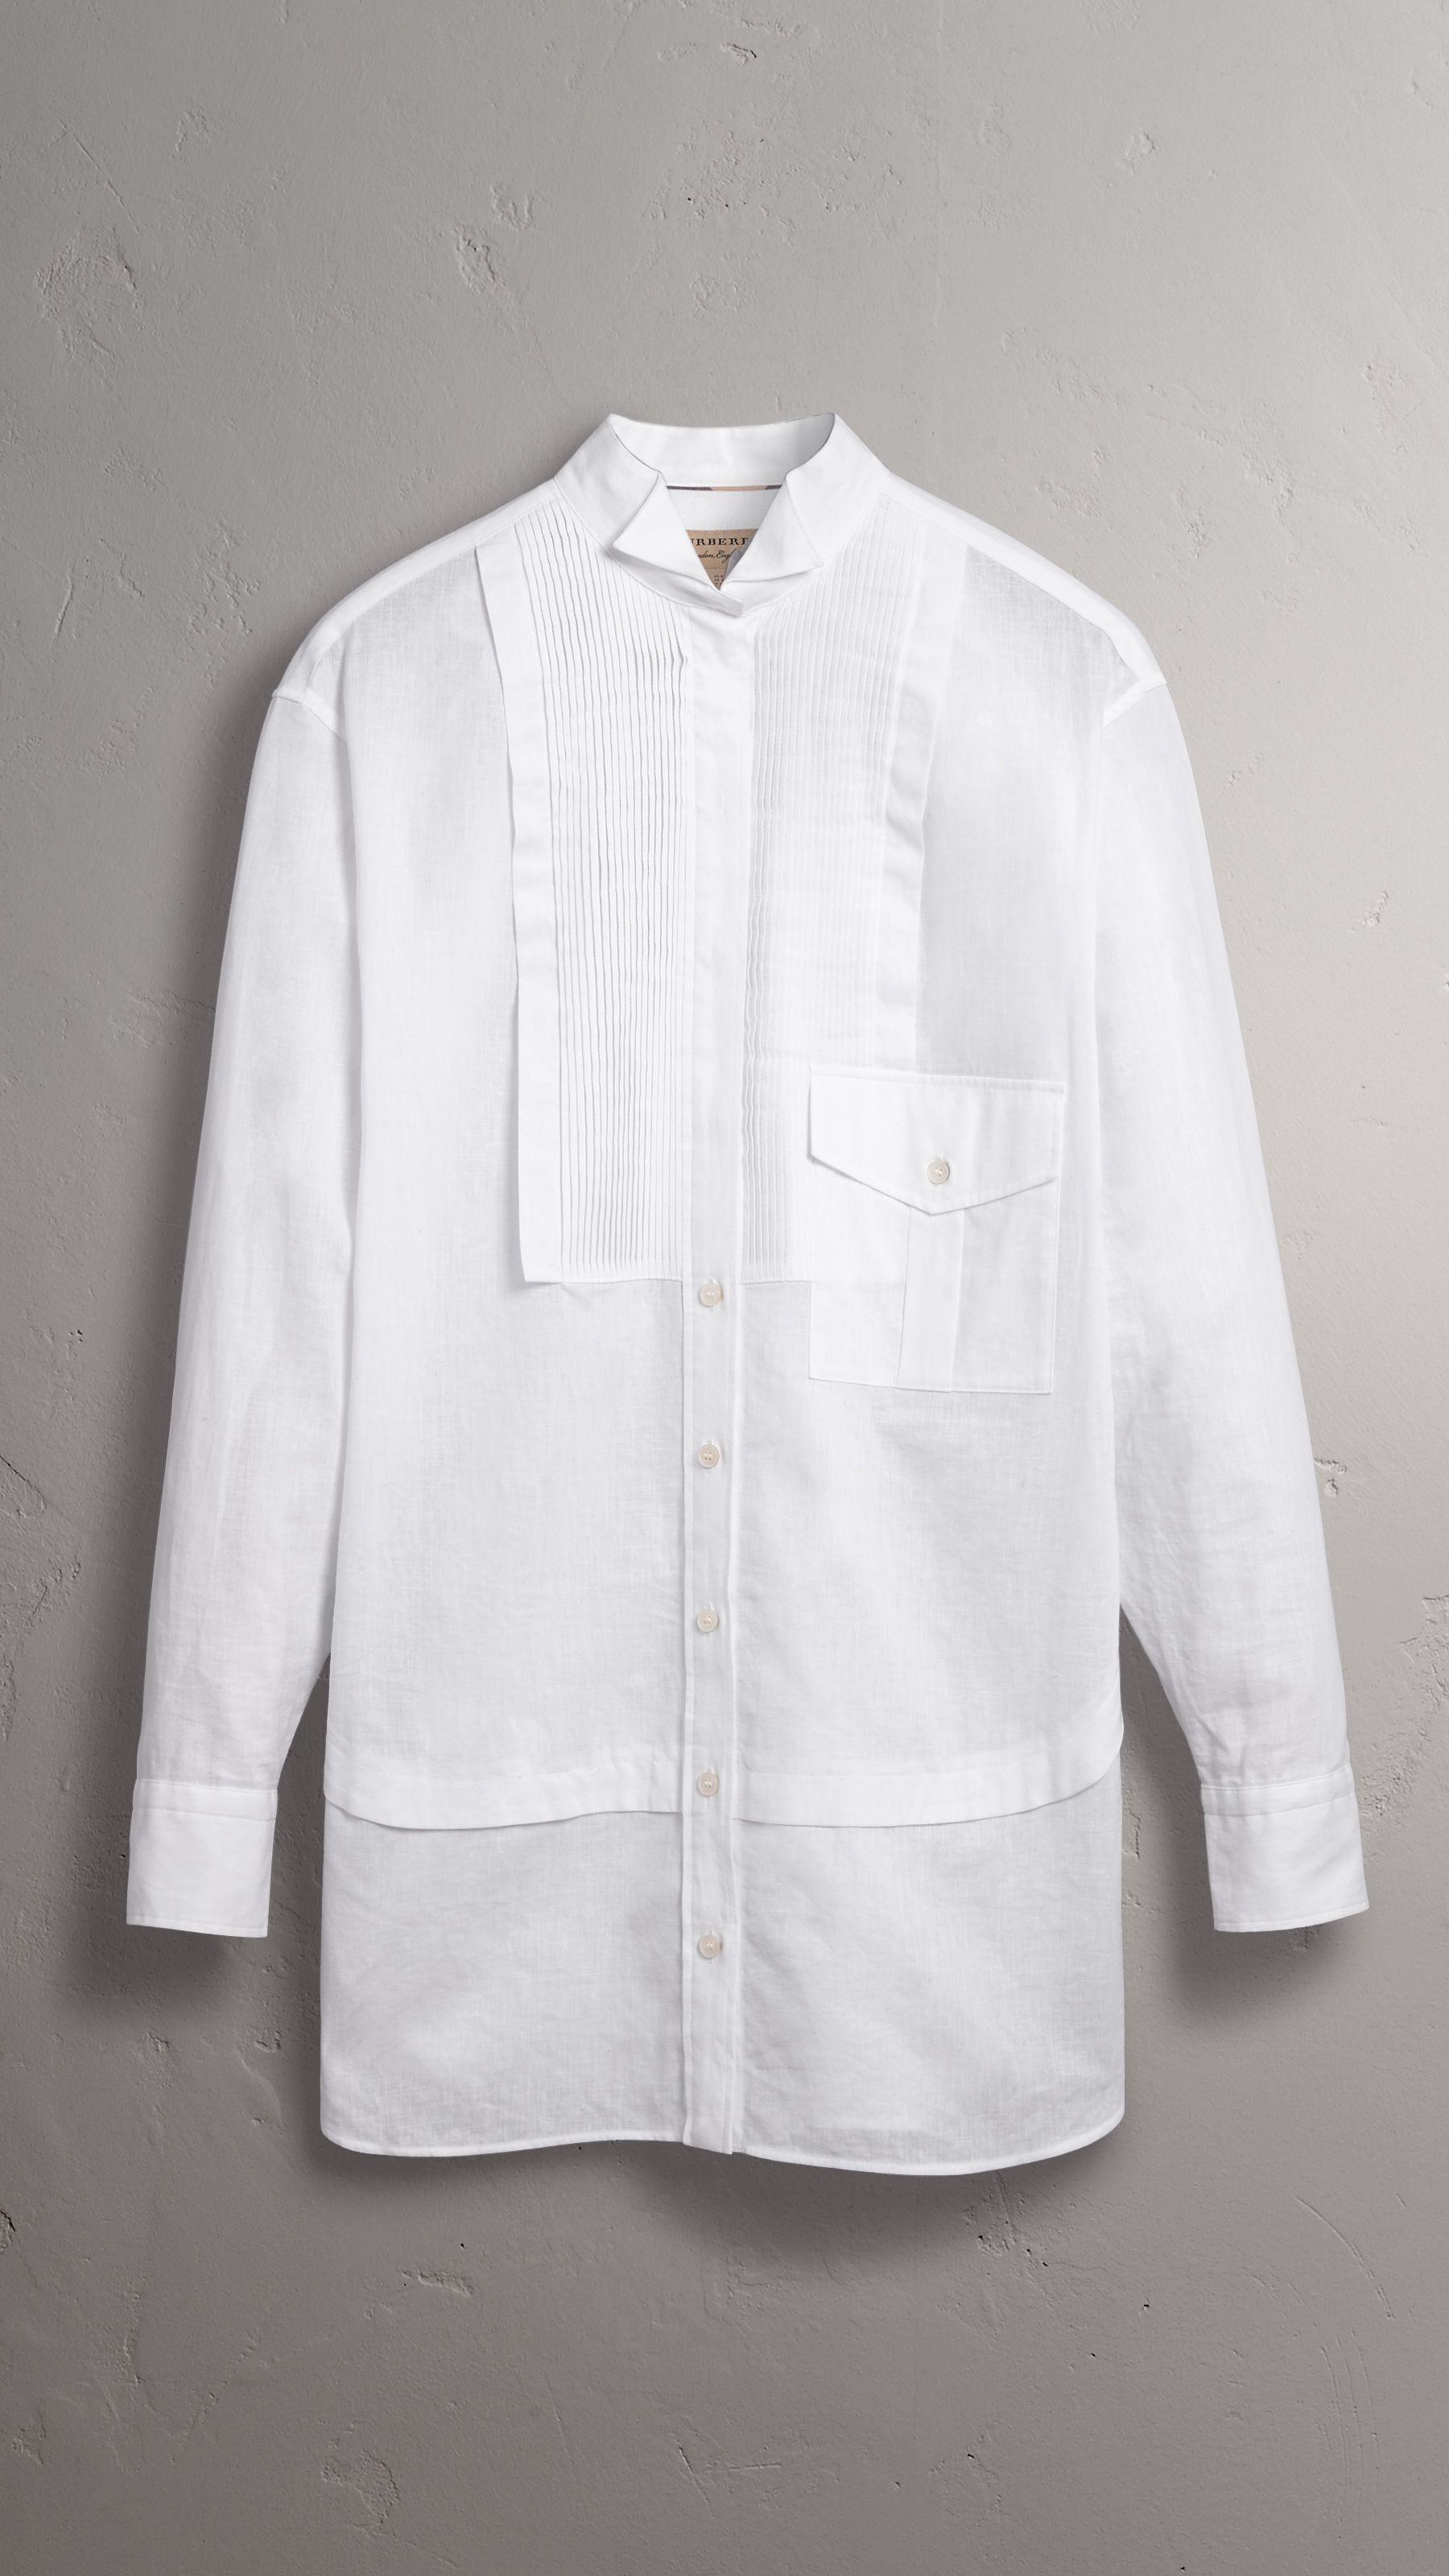 Pintuck Bib Wing Collar Longline Linen Cotton Shirt in White - Women | Burberry